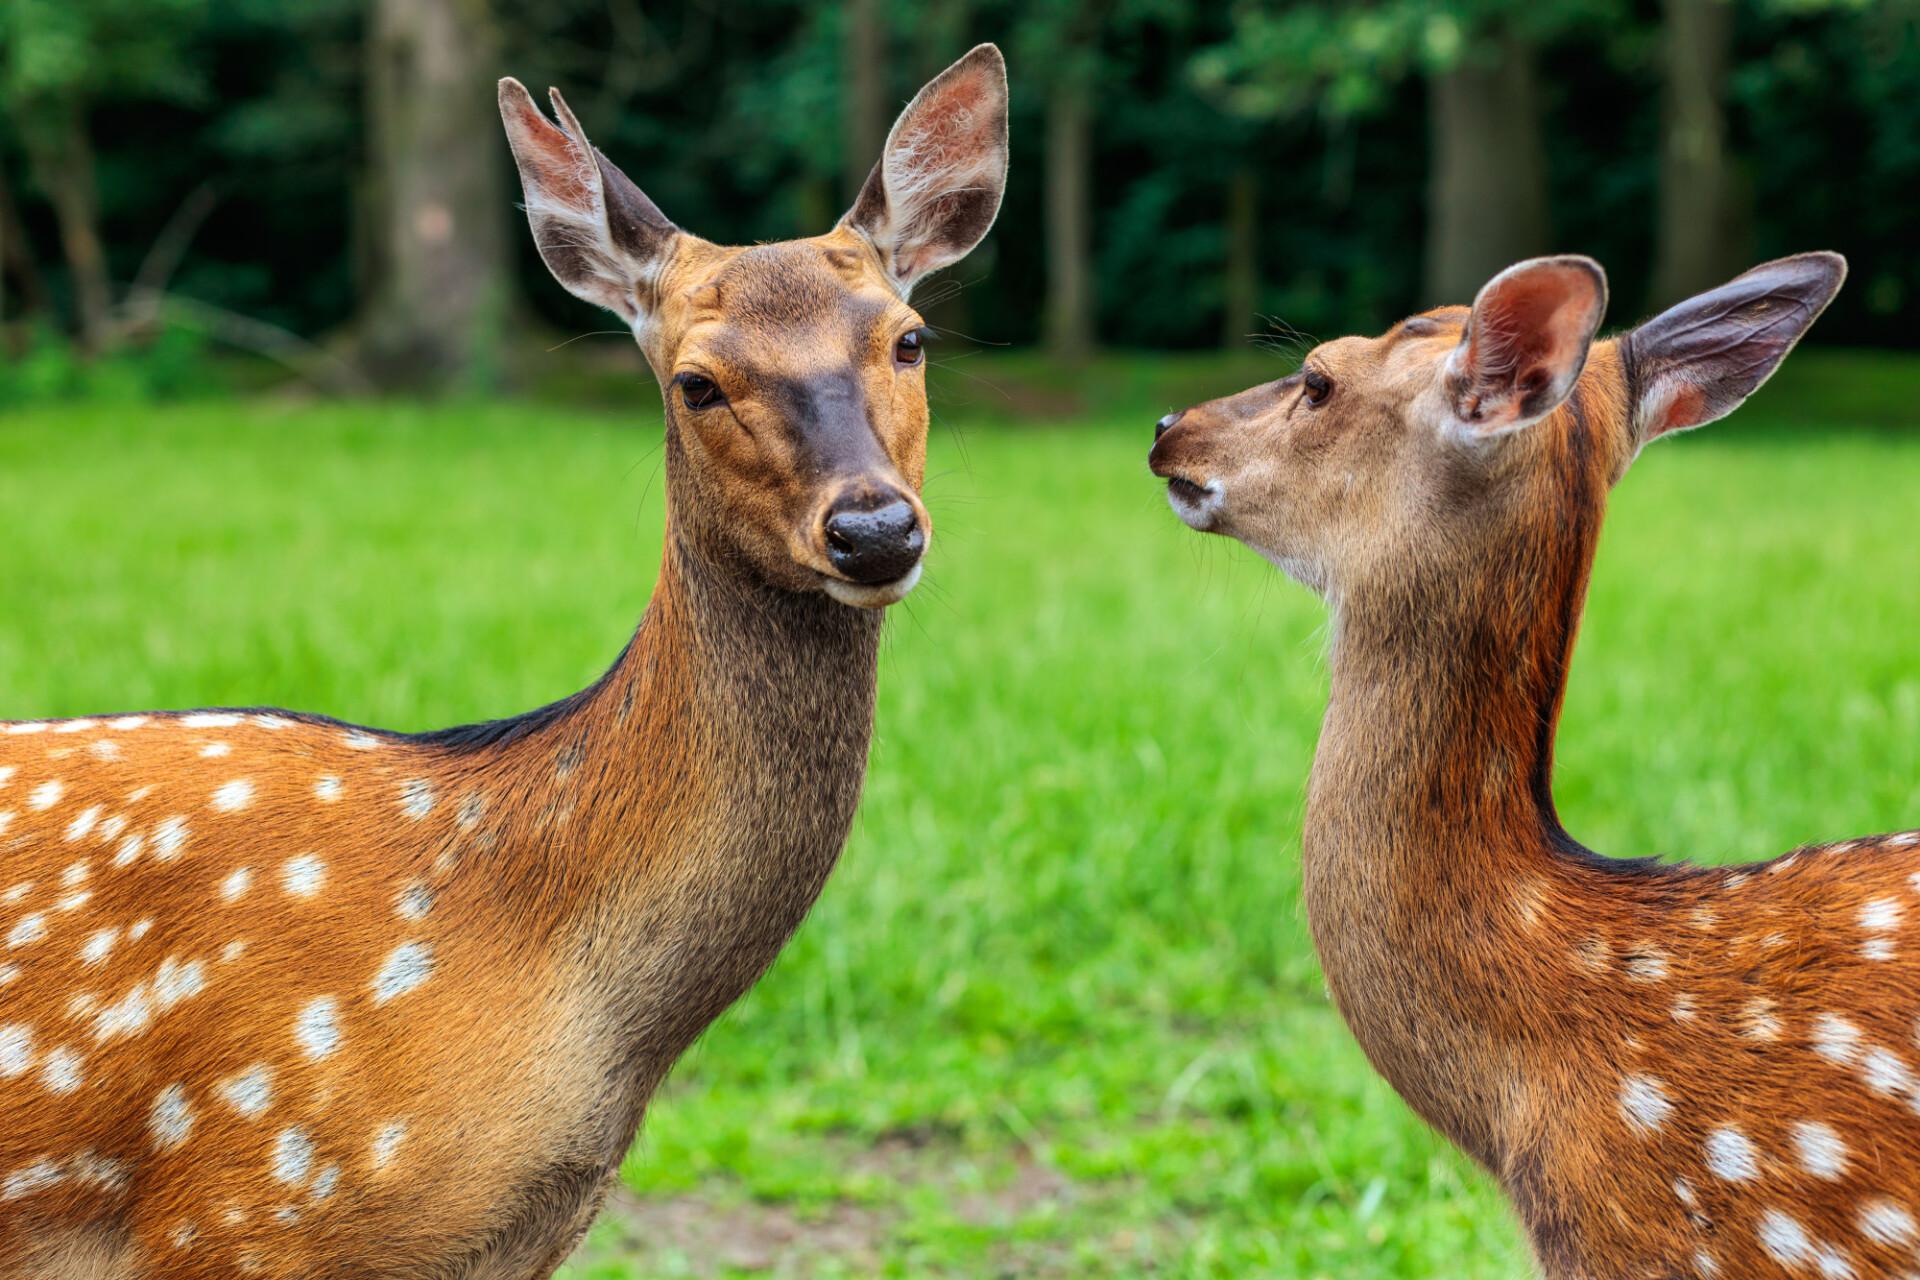 Two beautiful deer